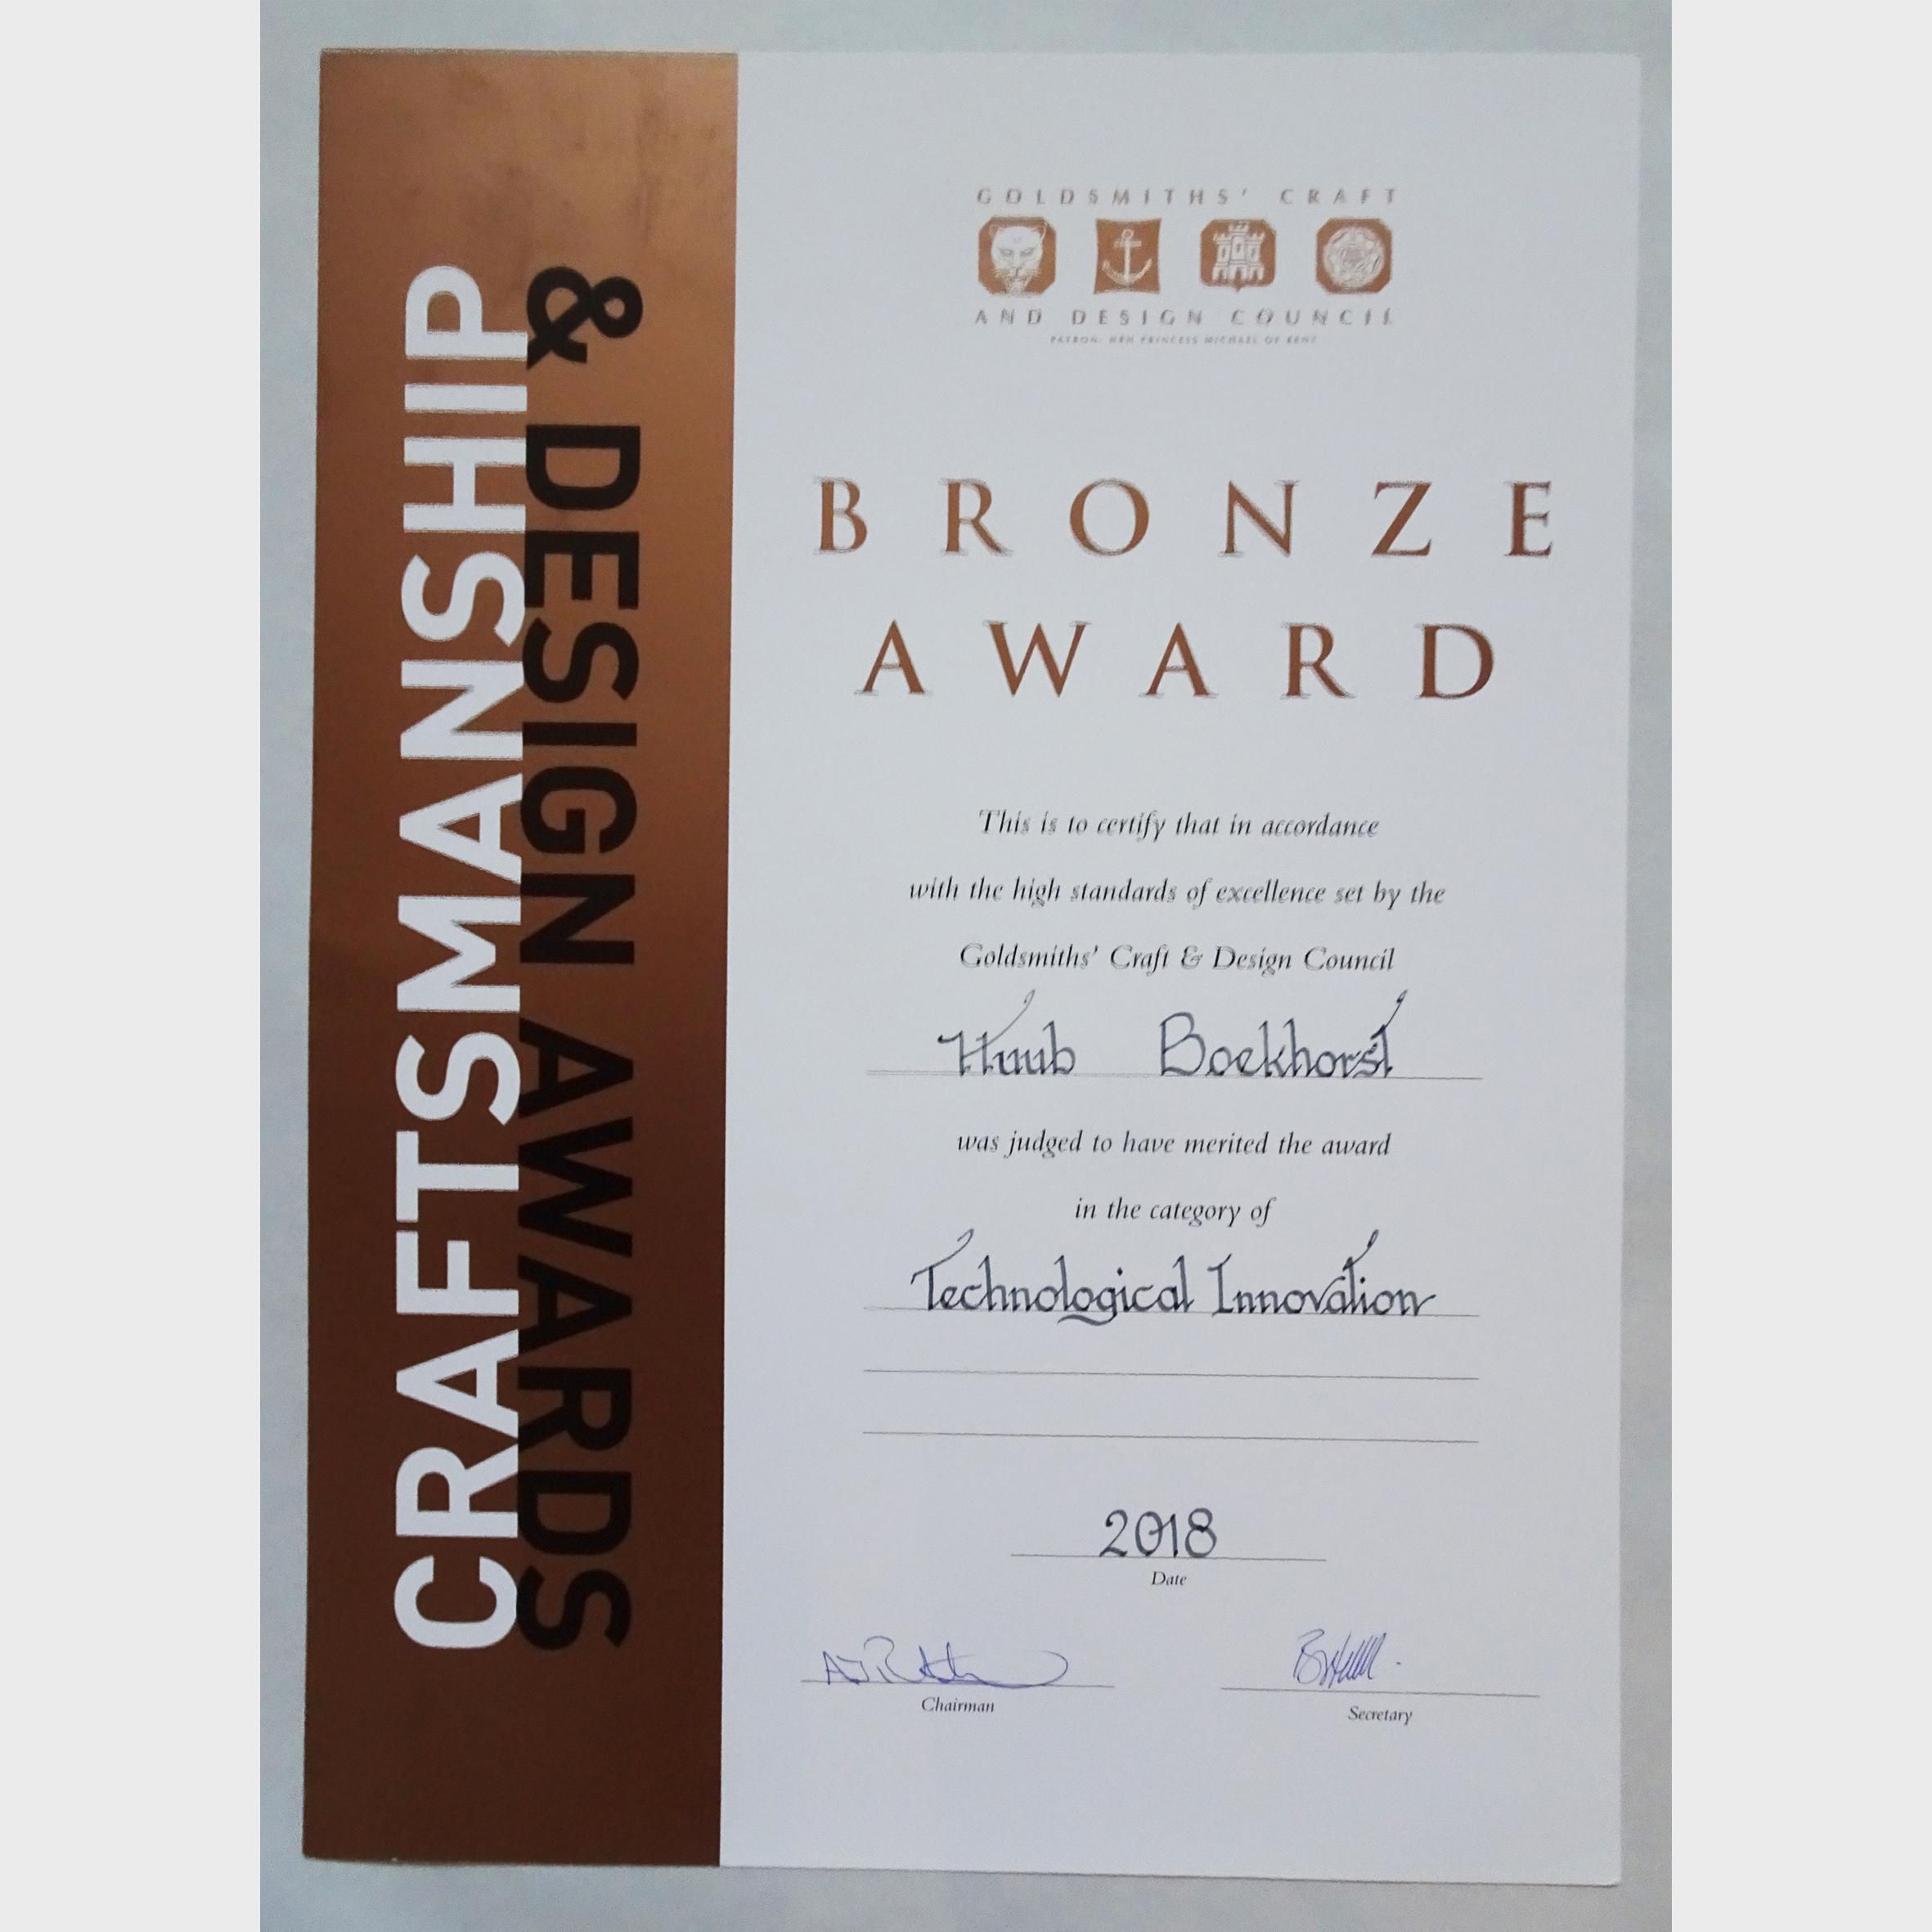 Goldsmiths' Craft & Design Council awards 2018